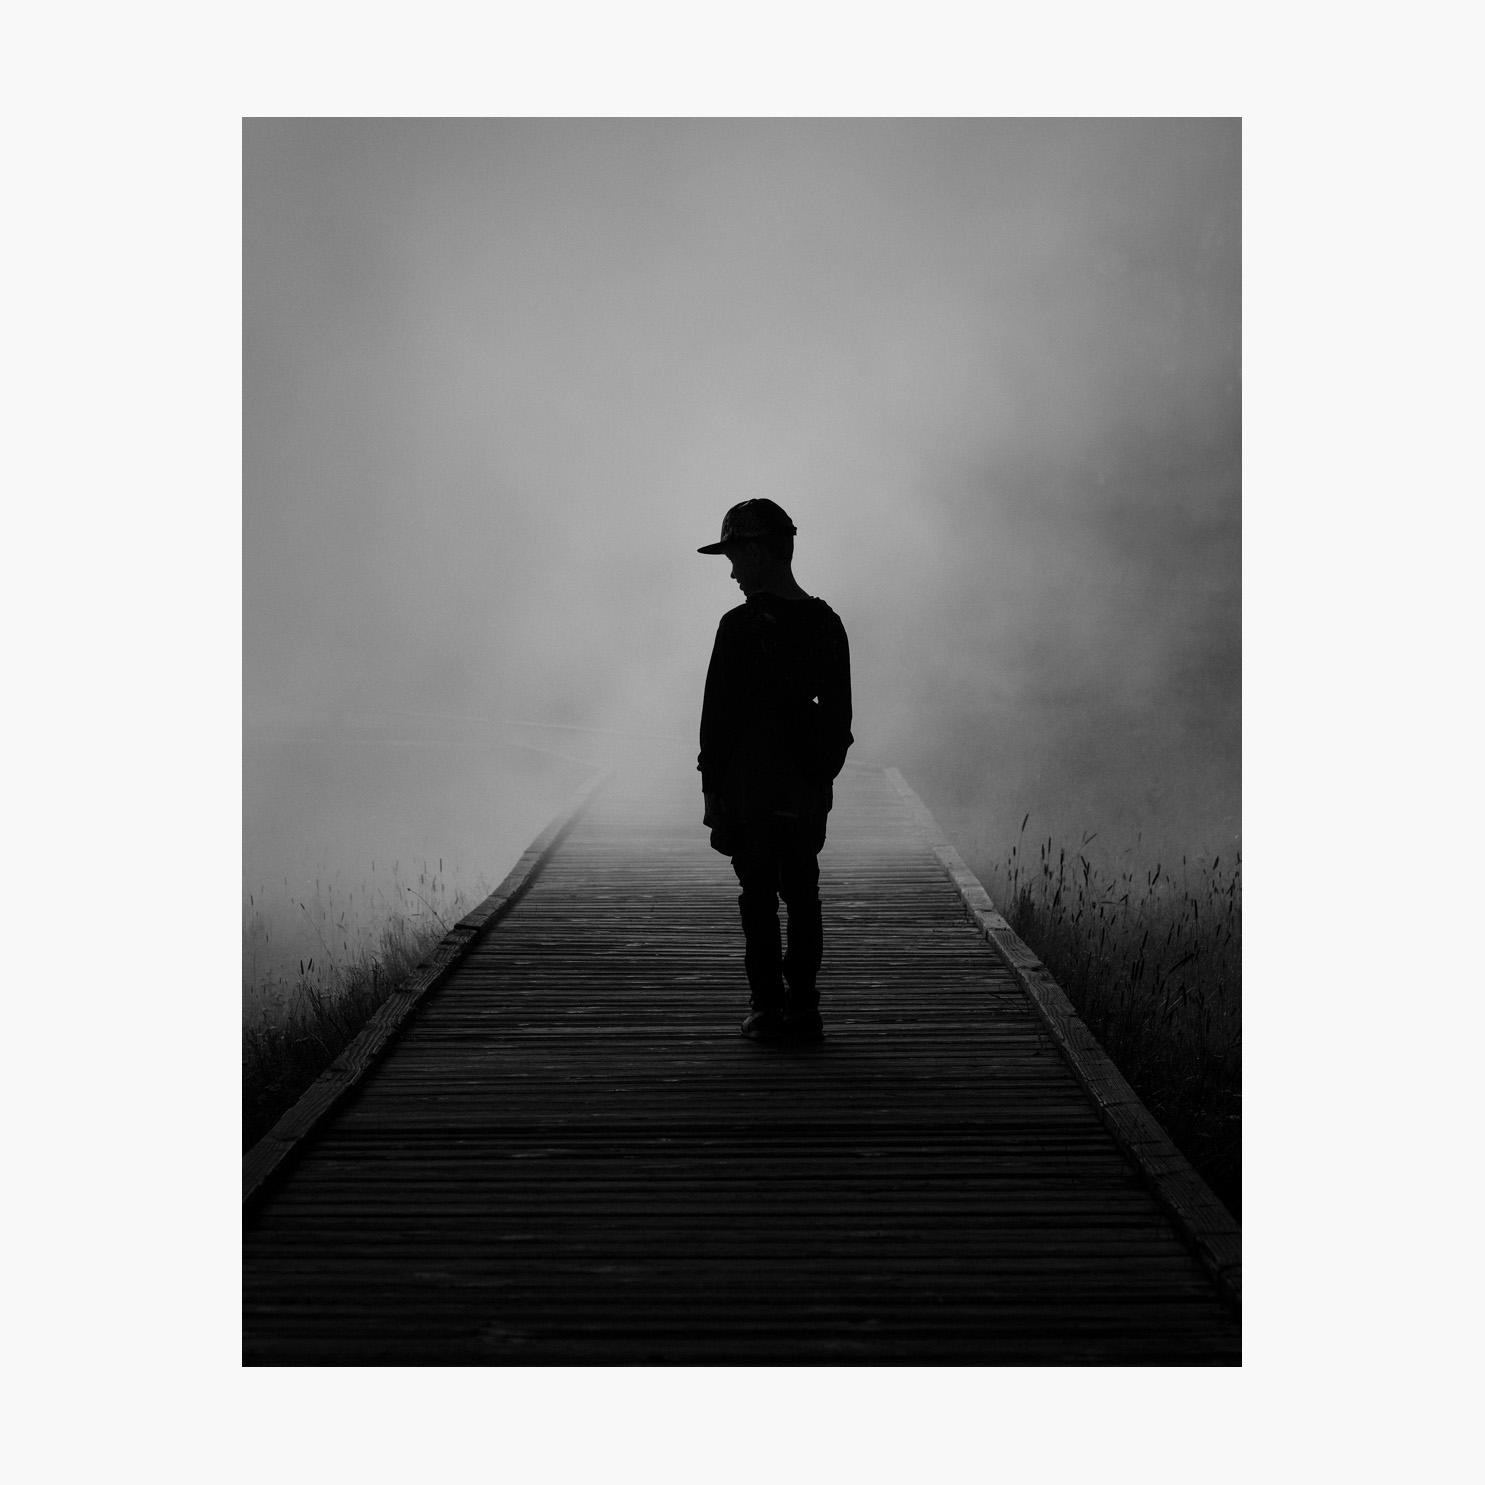 ©-Harry-W-Edmonds-2018-@photographersnote-Street-Sights-Social-PN15.jpg